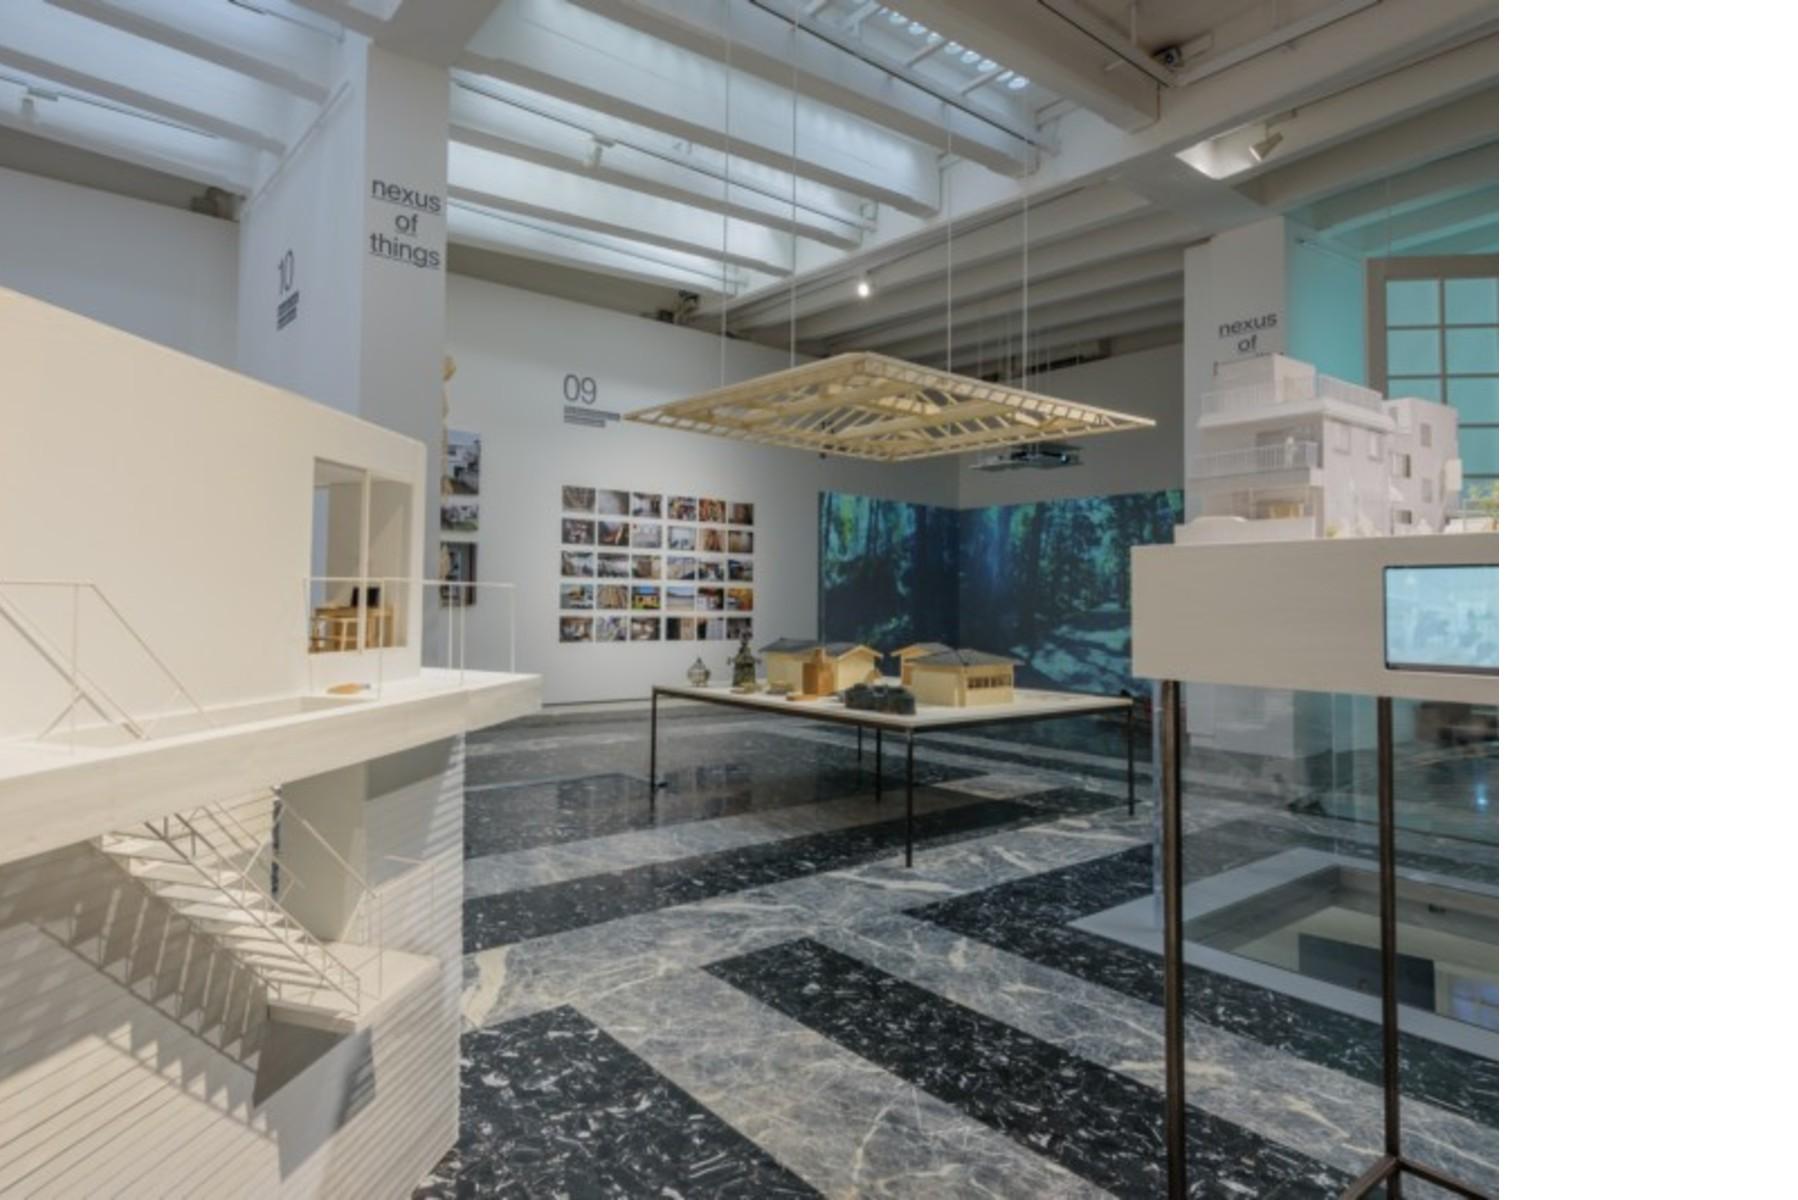 Images courtesy of La Biennale di Venezia, photo by Andrea Avezzù